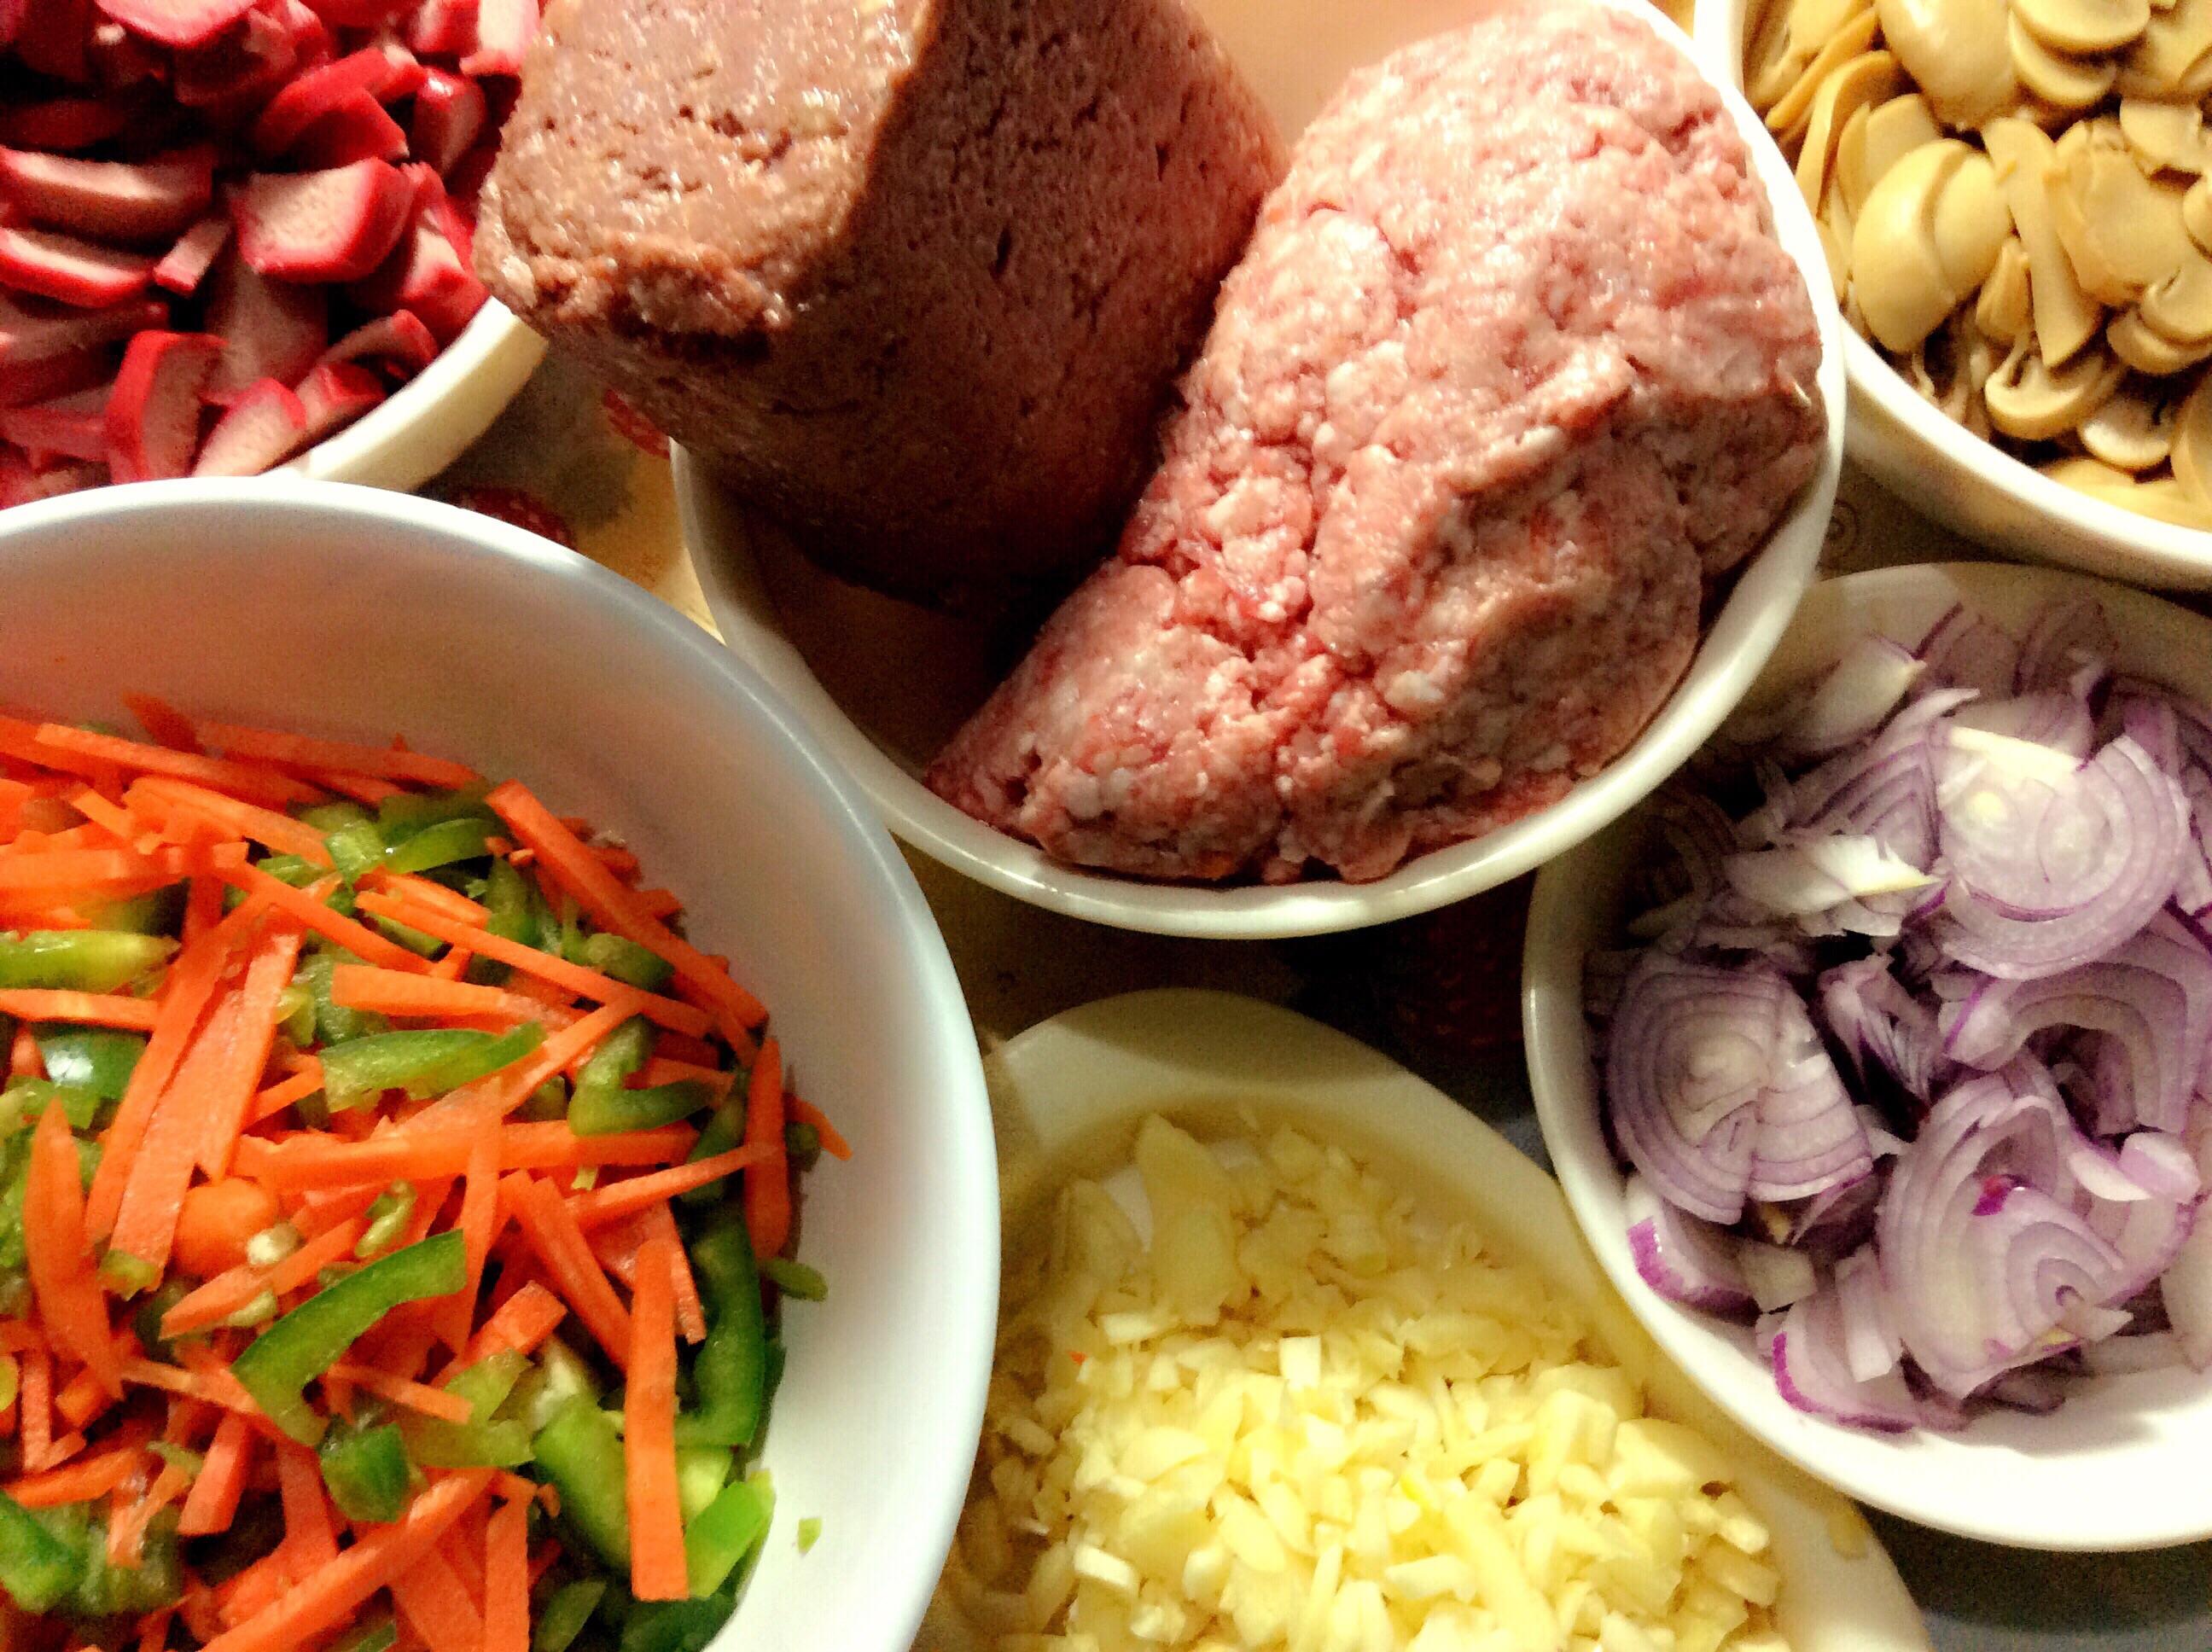 Fish Sauce Cooking Oil Salt Pinoy Style Spaghetti Sauce